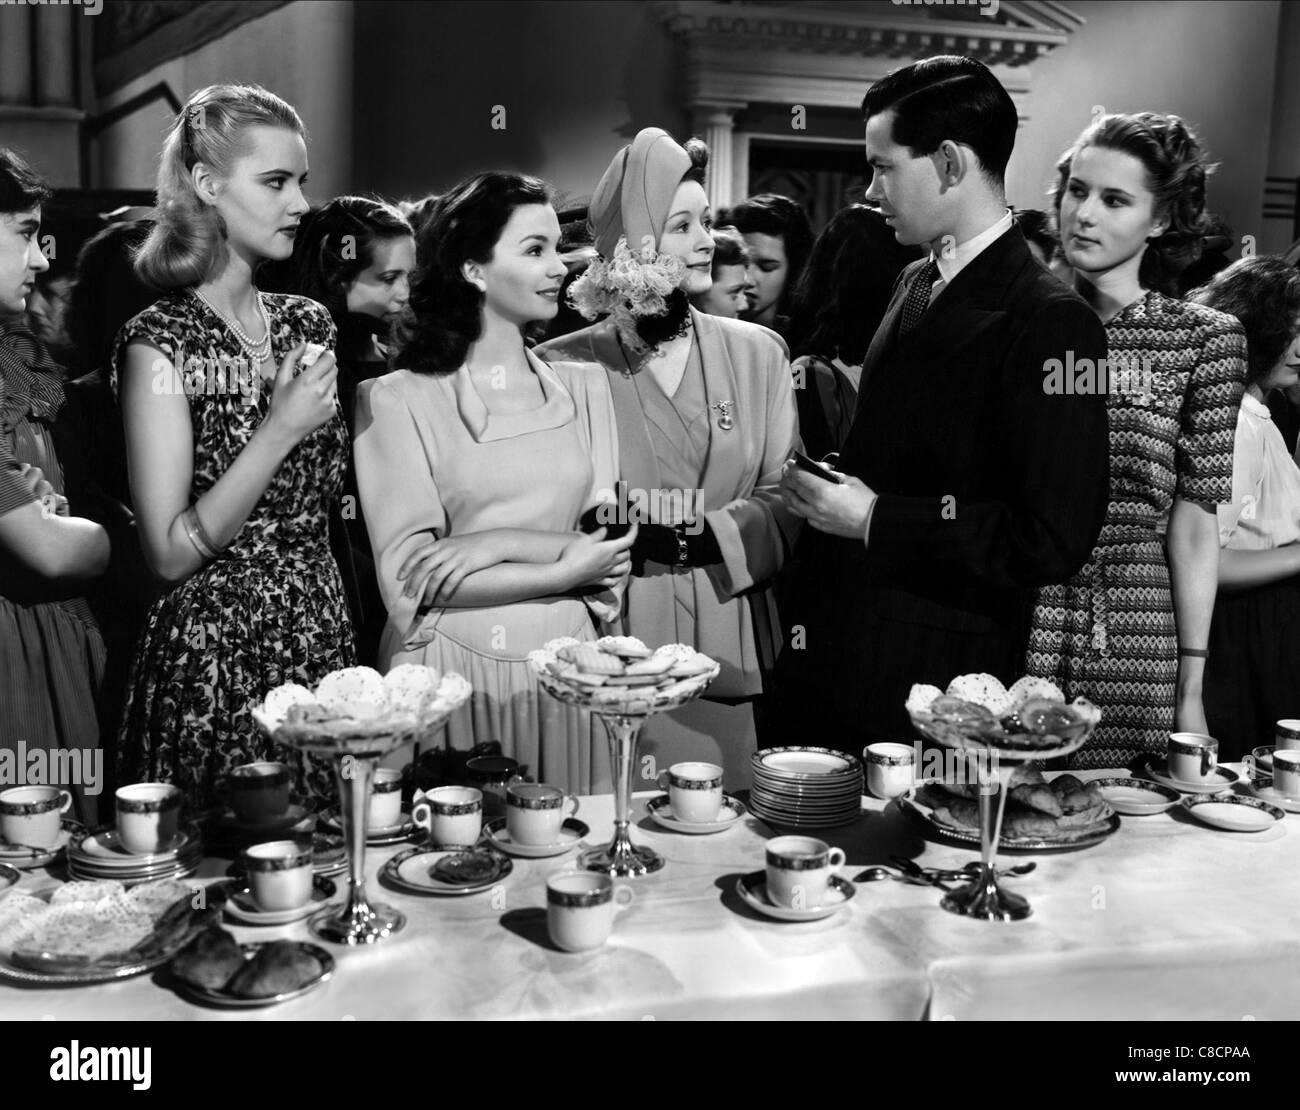 JOAN MILLER, JEAN SIMMONS, URSULA JEANS, NIGEL BUCHANAN, INGRID FORREST, THE WOMAN IN THE HALL, 1947 - Stock Image